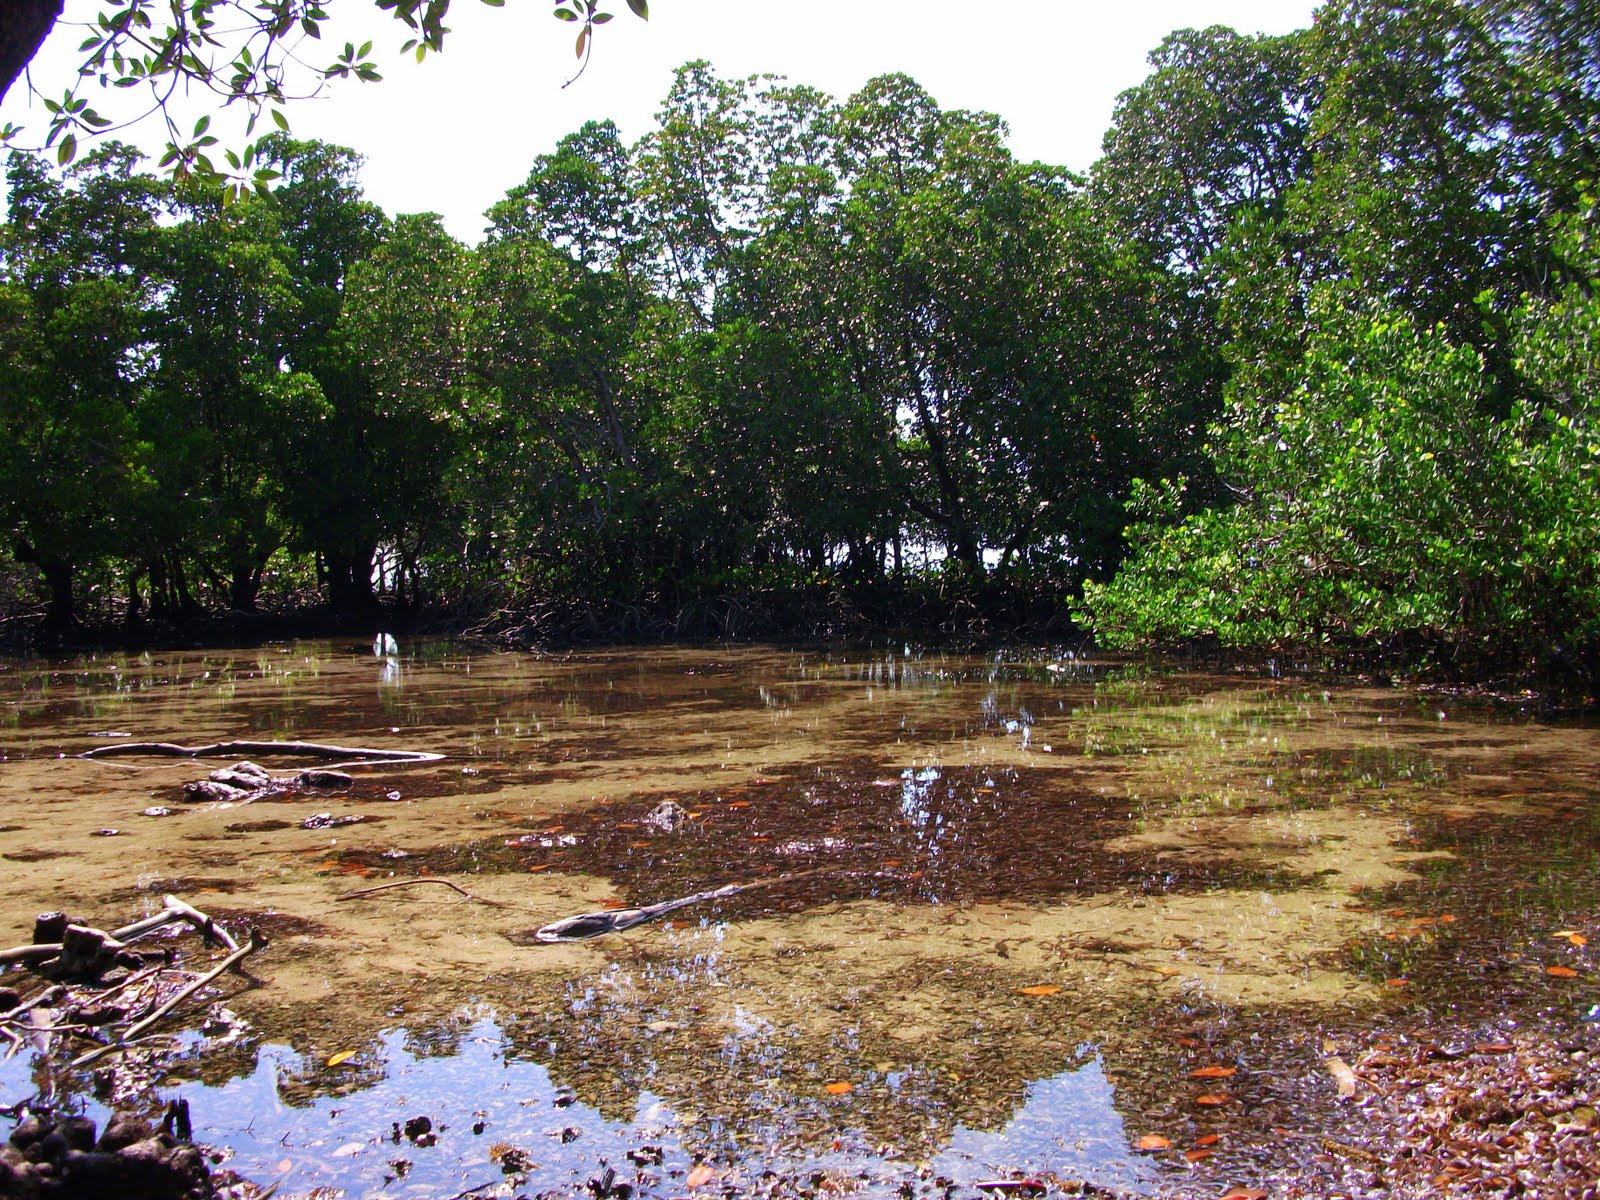 marine mammal primate and coastal habitat conservation in kenya the mangroves. Black Bedroom Furniture Sets. Home Design Ideas